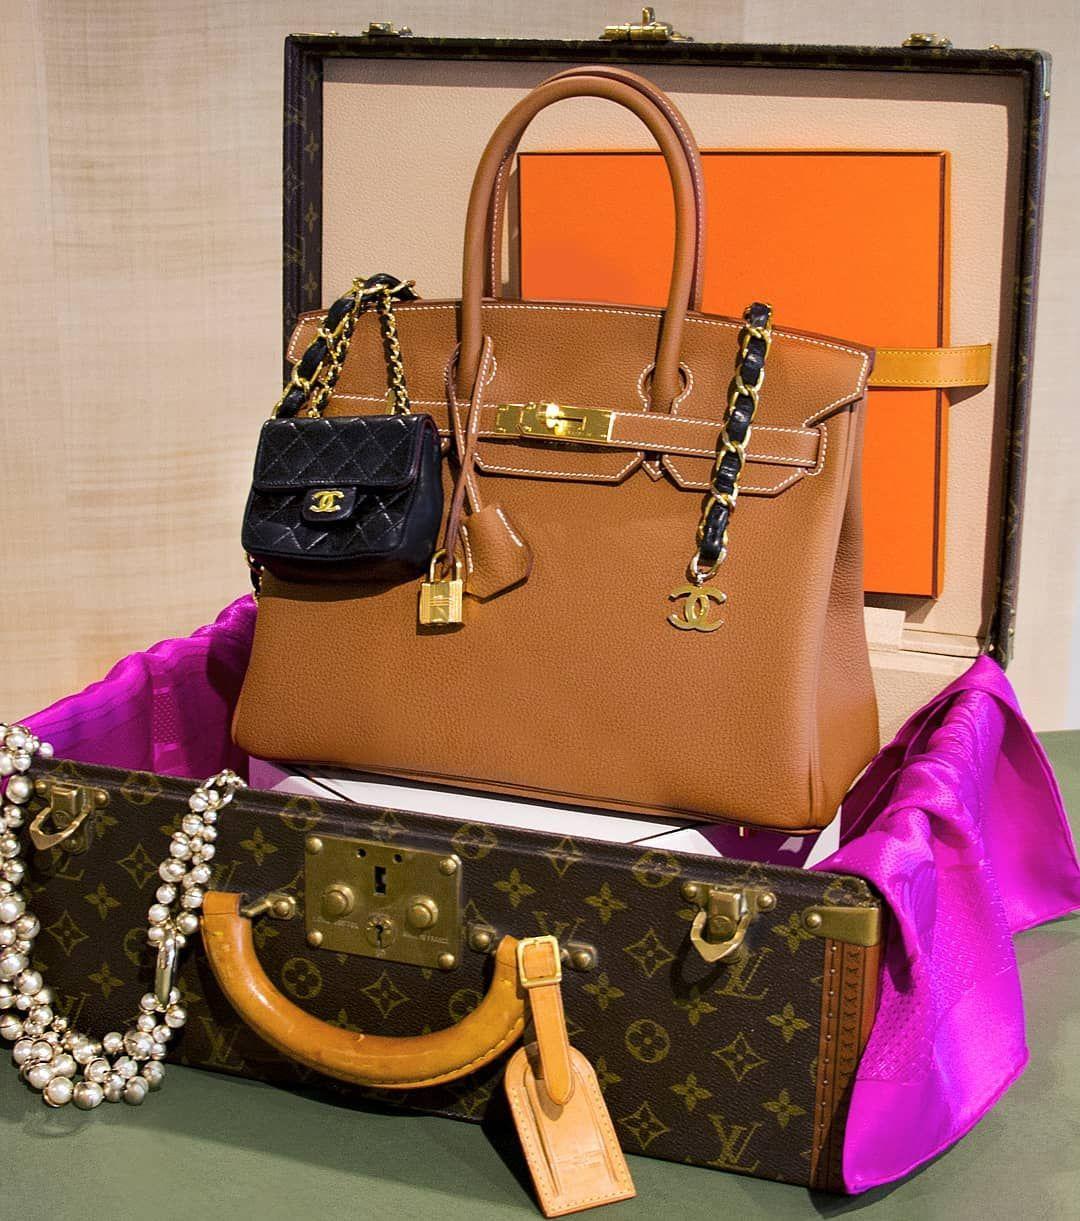 c4b4db1524c Louis Vuitton · Vintage Outfits · Diy Handbag · The perfect set-up.   labellov  antwerpfashion  lovelabellov  hermes  hermesbirkin